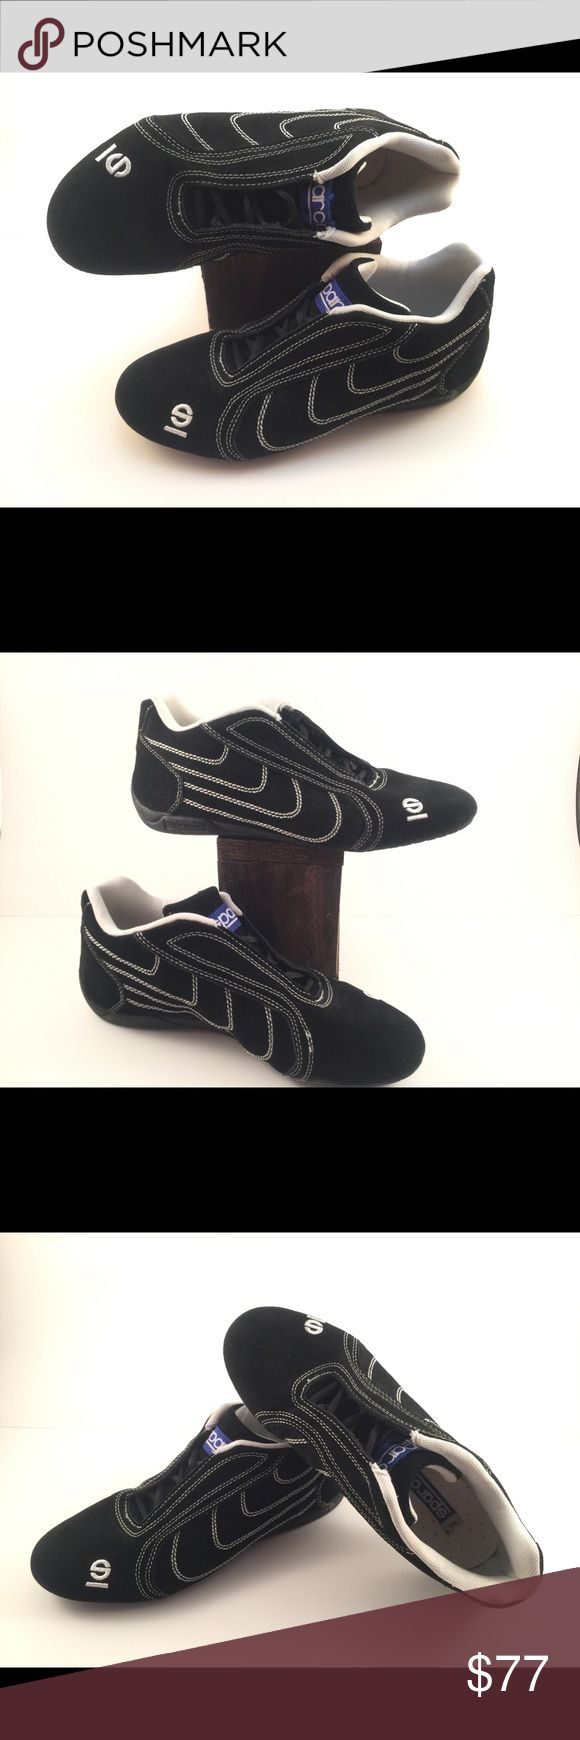 Cheap dress boots ladies 4x100